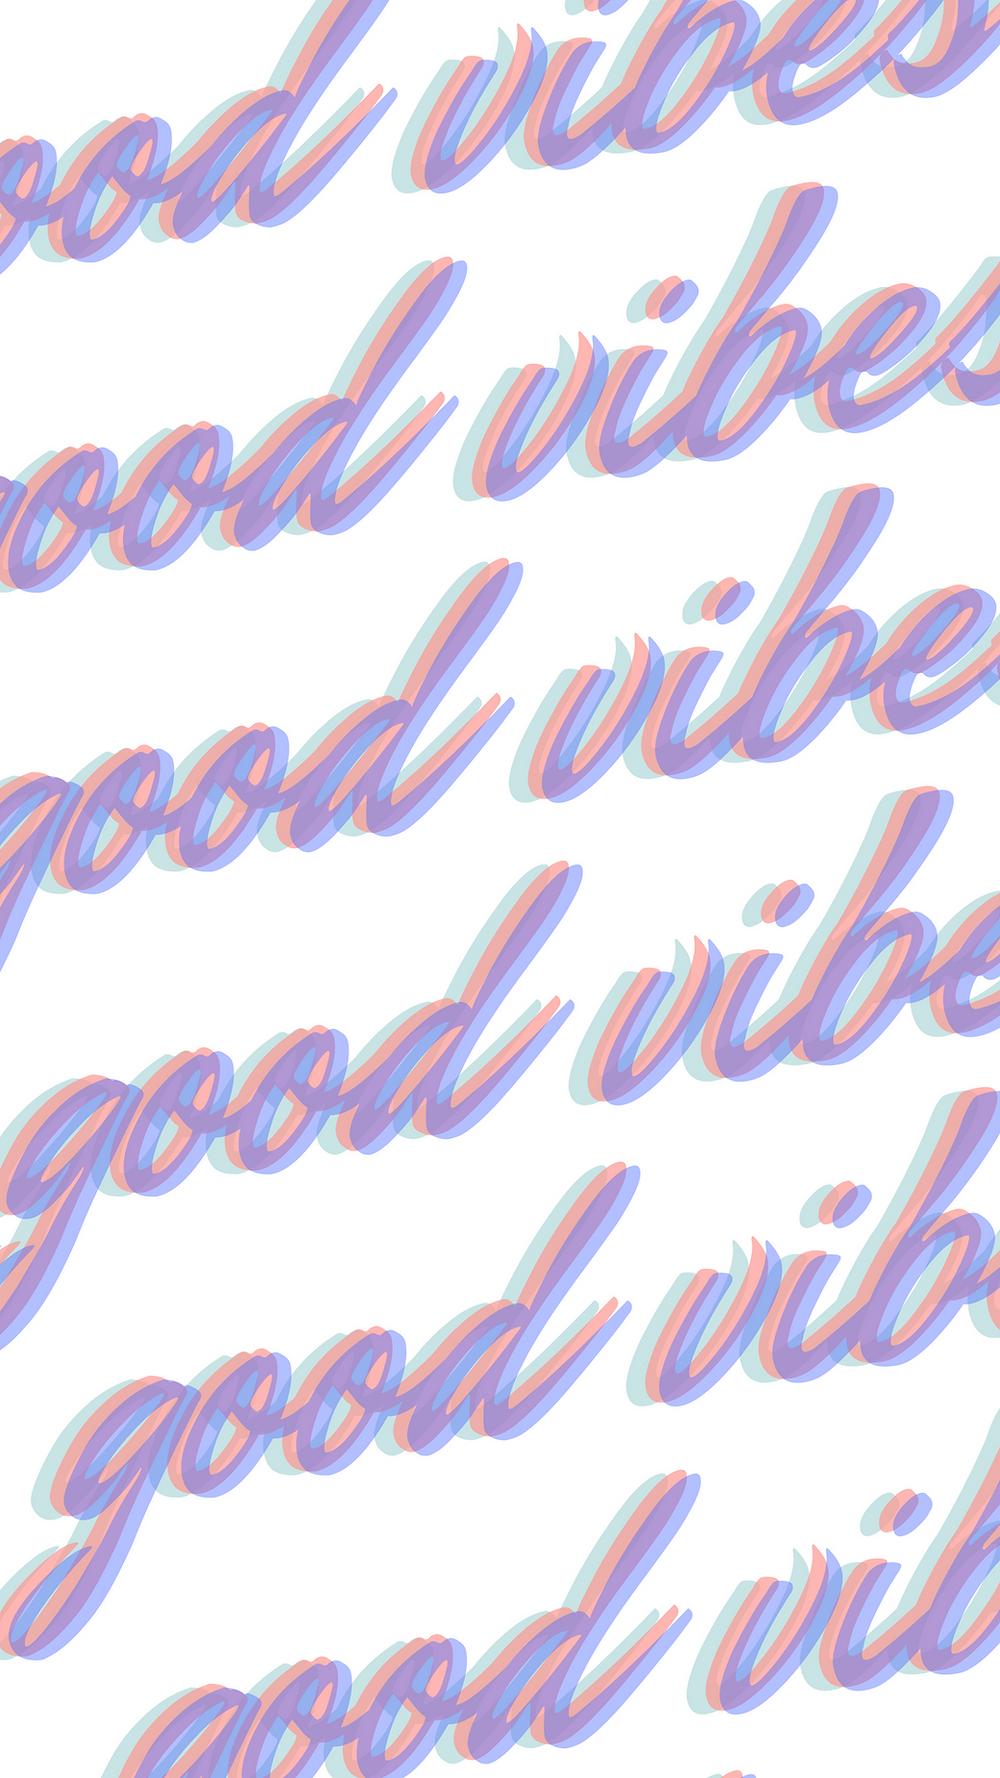 phone good vibes wallpaper